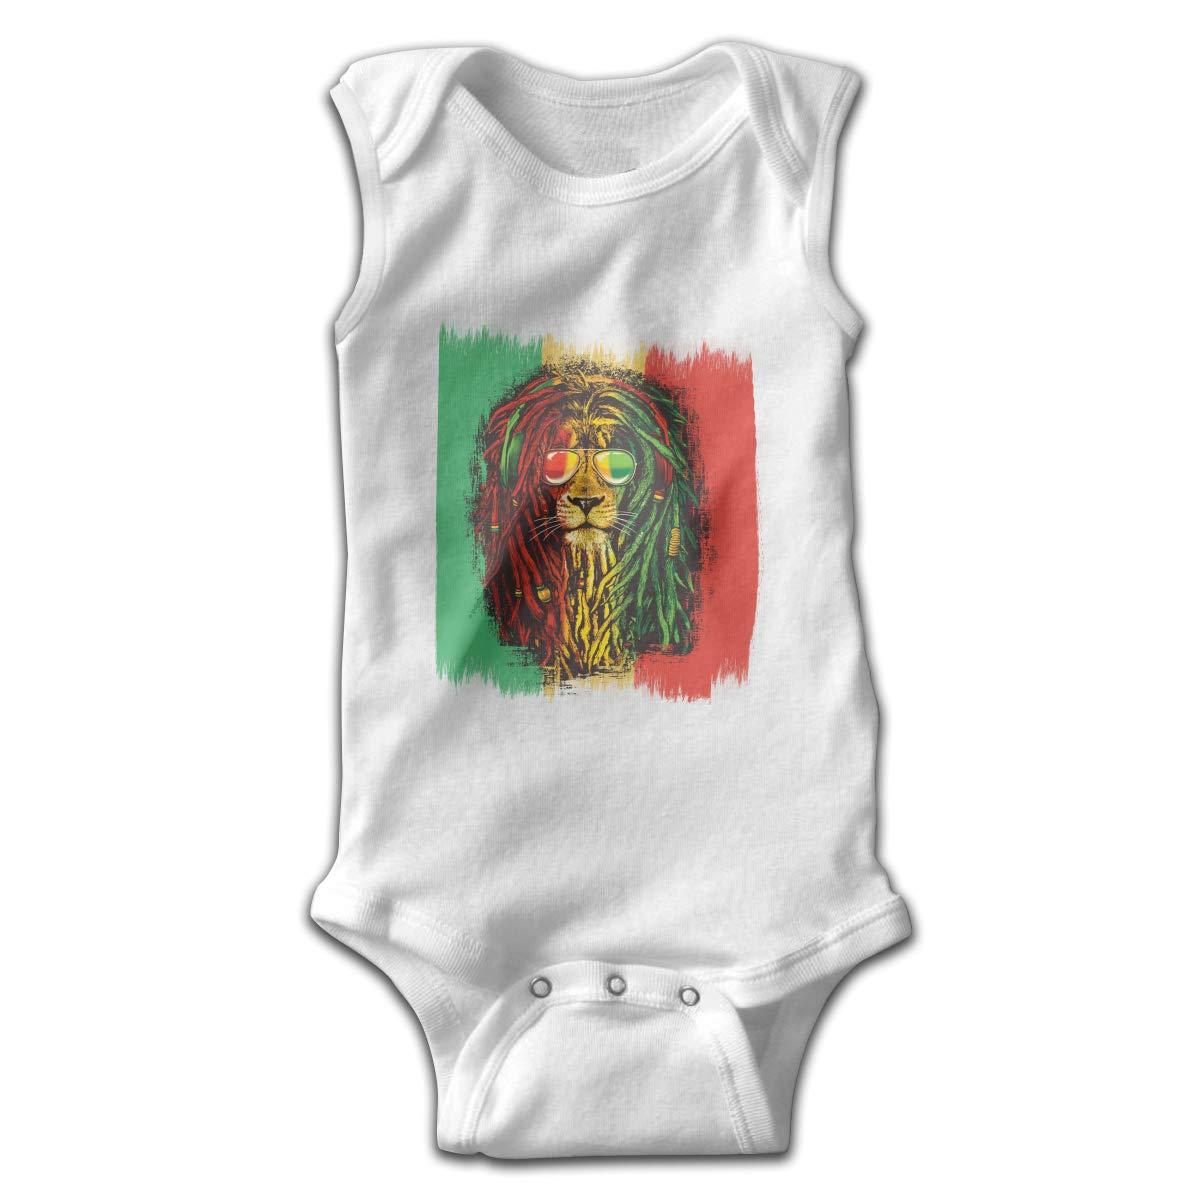 Dunpaiaa Reggae Rasta Flag Lion Newborn Crawling Suit Sleeveless Romper Bodysuit Onesies Jumpsuit Black